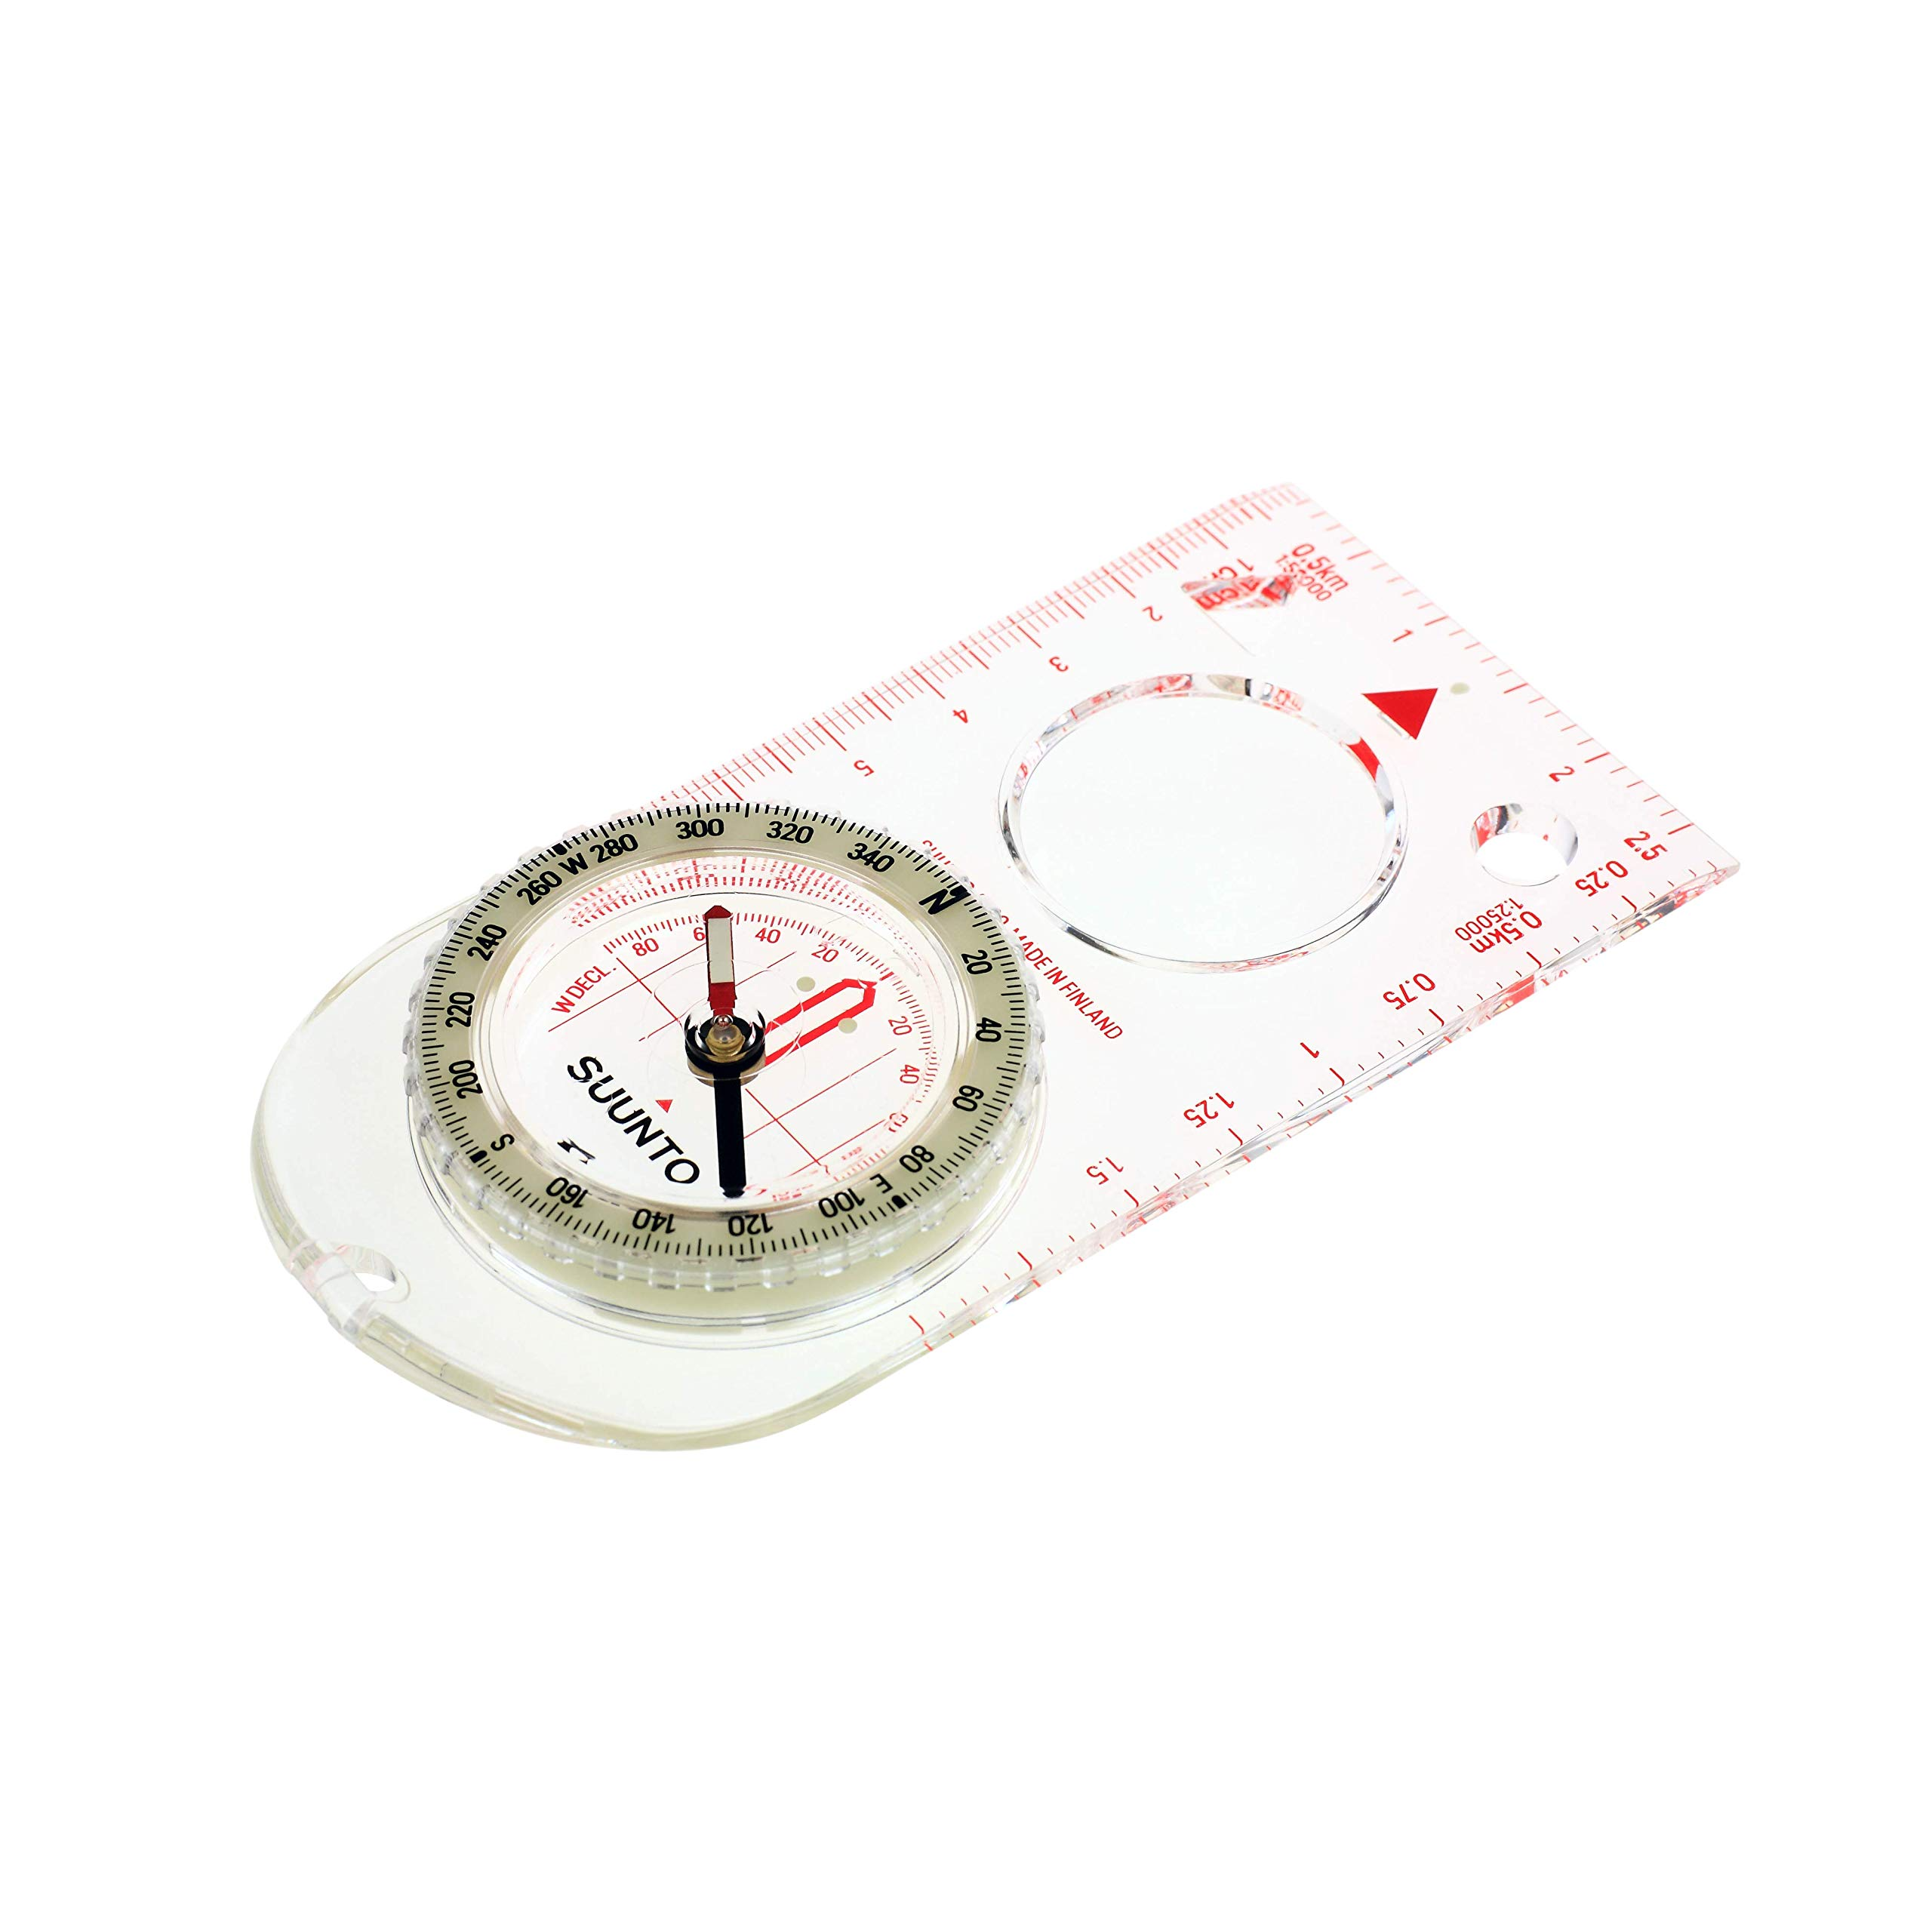 Antiques Honest Antique Brass Flat Pocket Compass With Back Side Sir Wm Gell John Auldjo Item Maritime Compasses